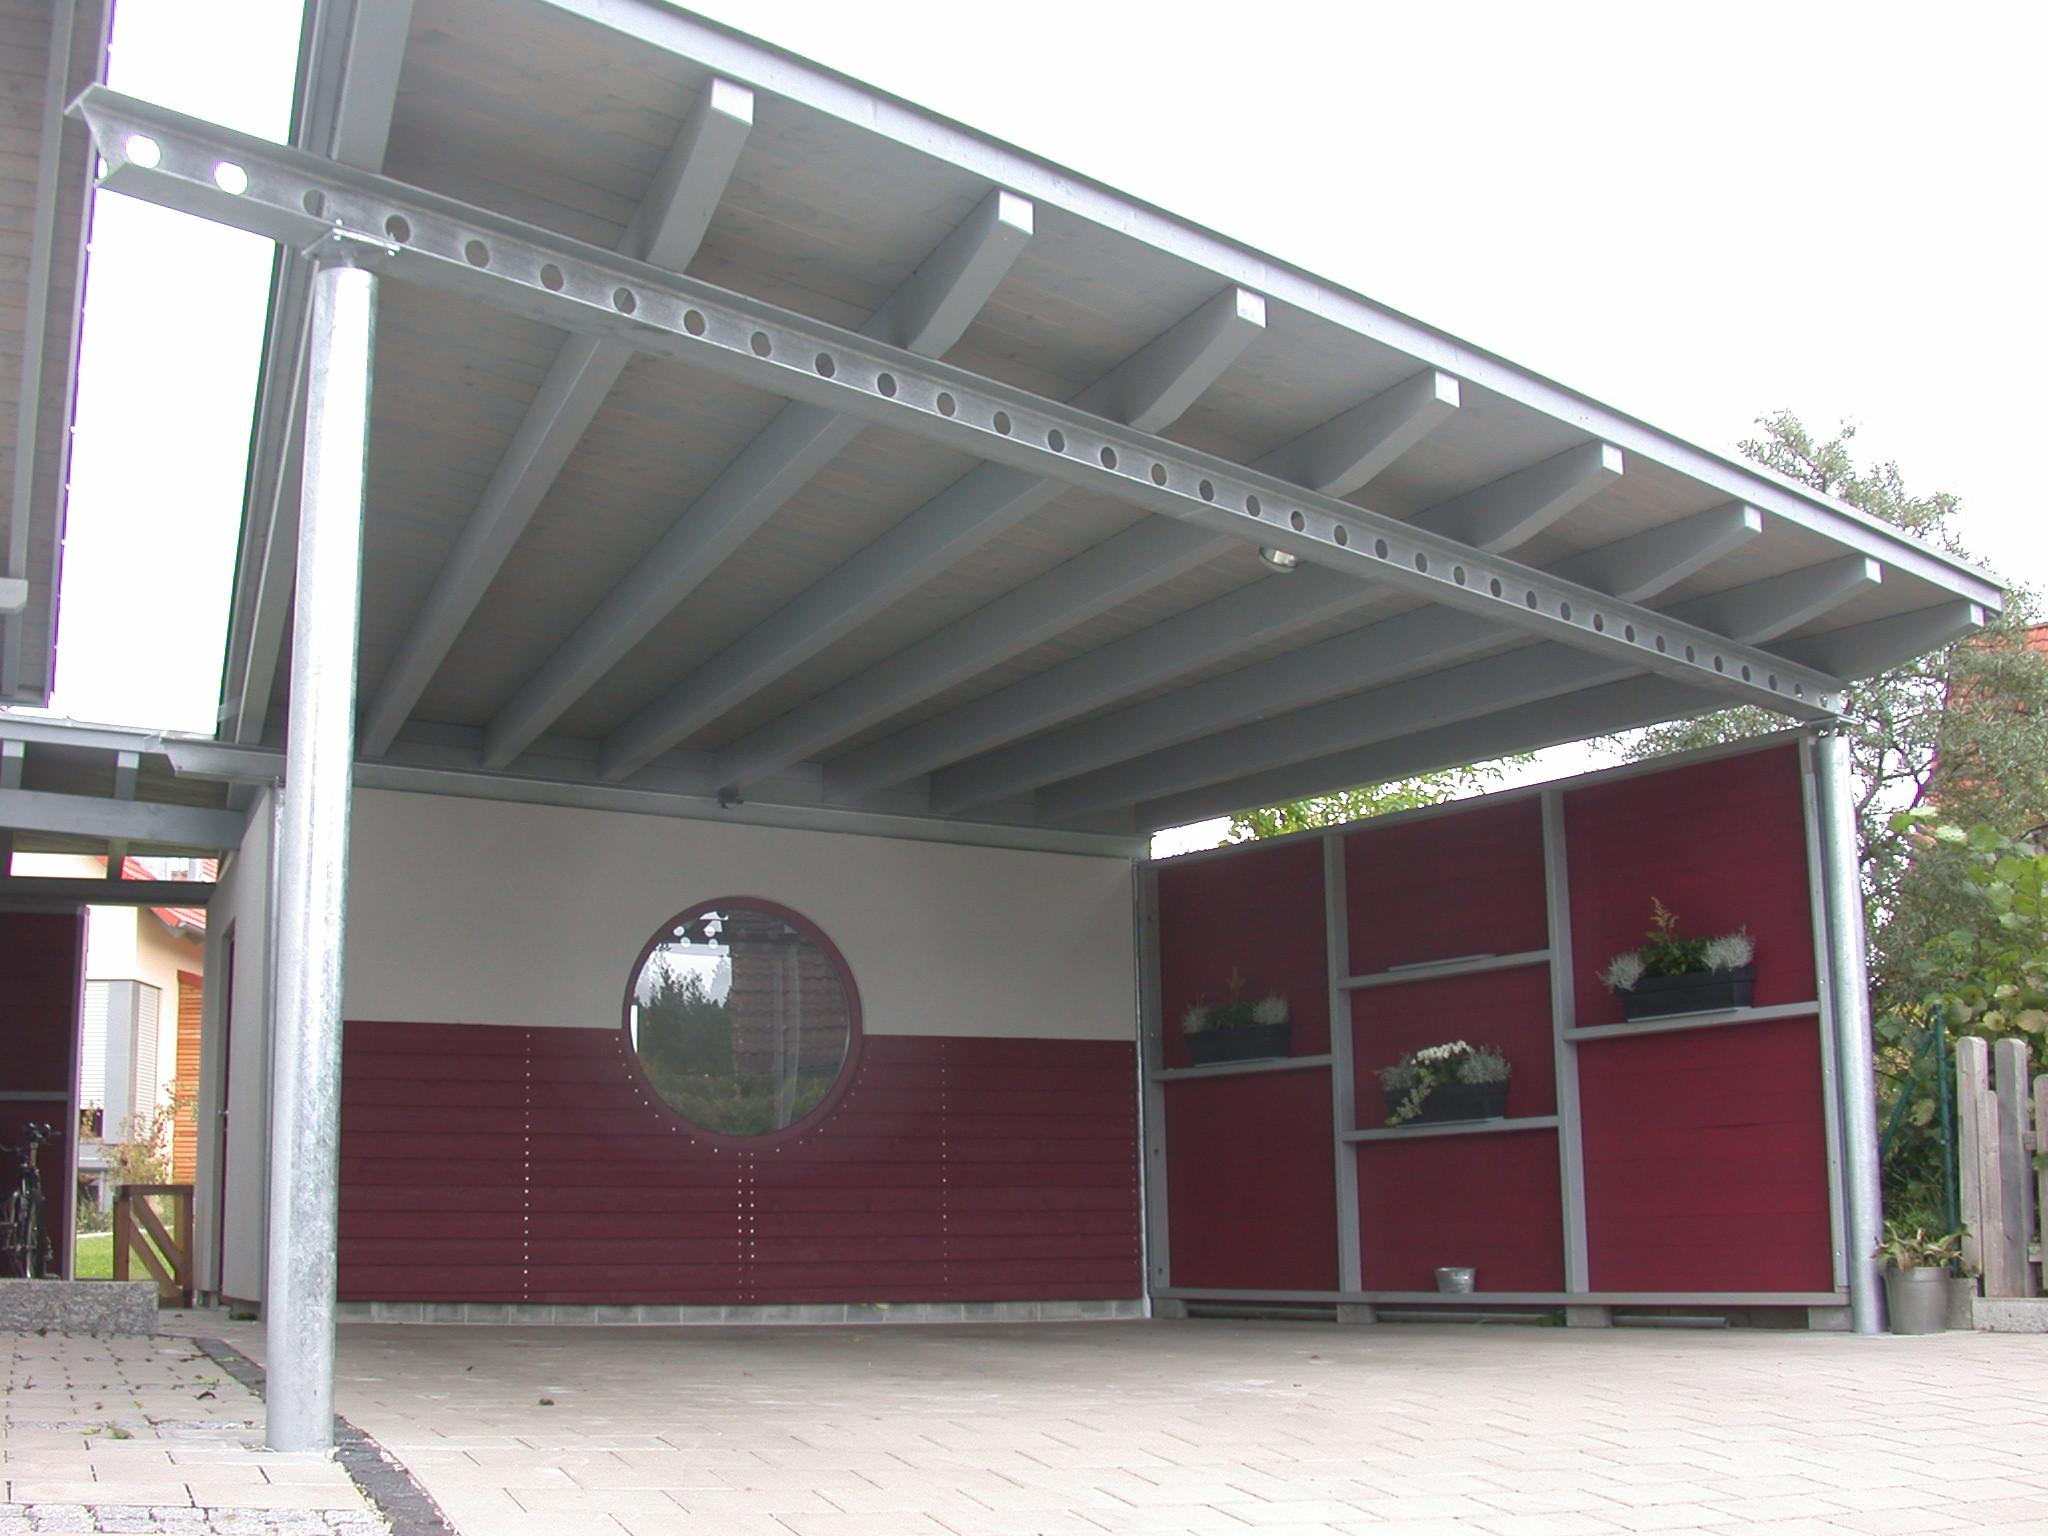 Galerie carport for Dachkonstruktion carport